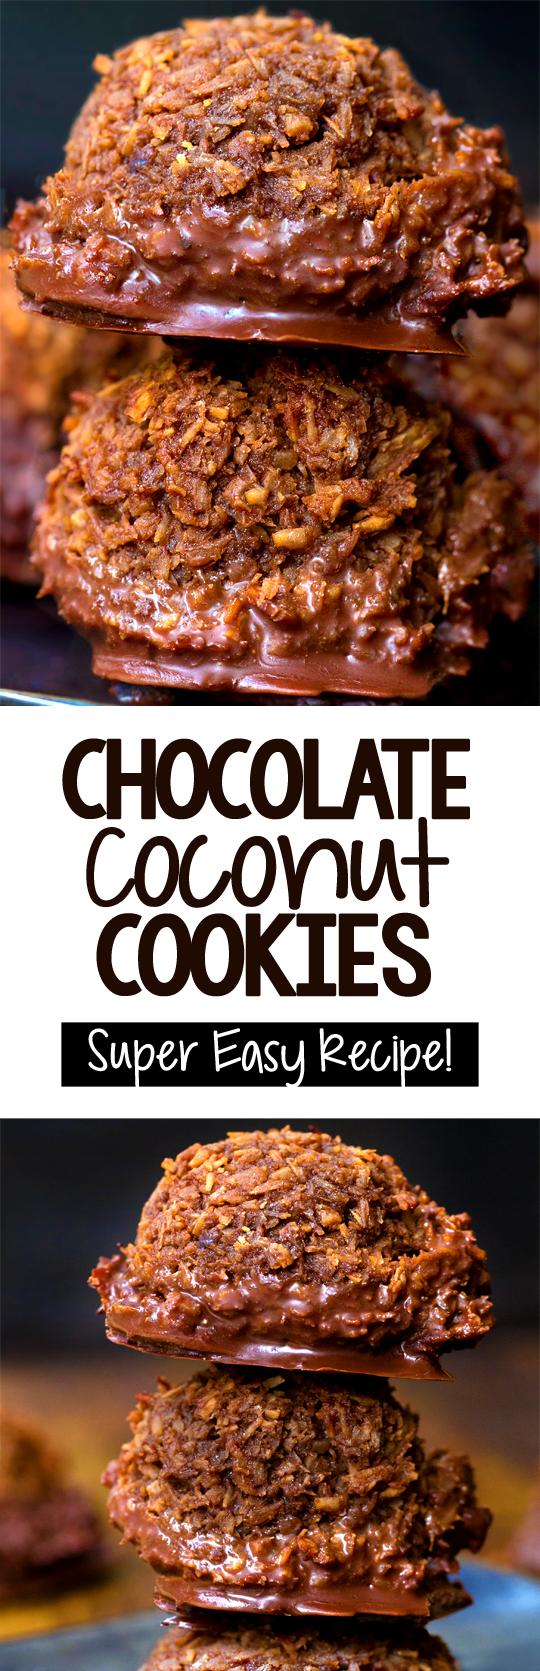 Chocolate Coconut Cookies - Chocolate Covered Kati